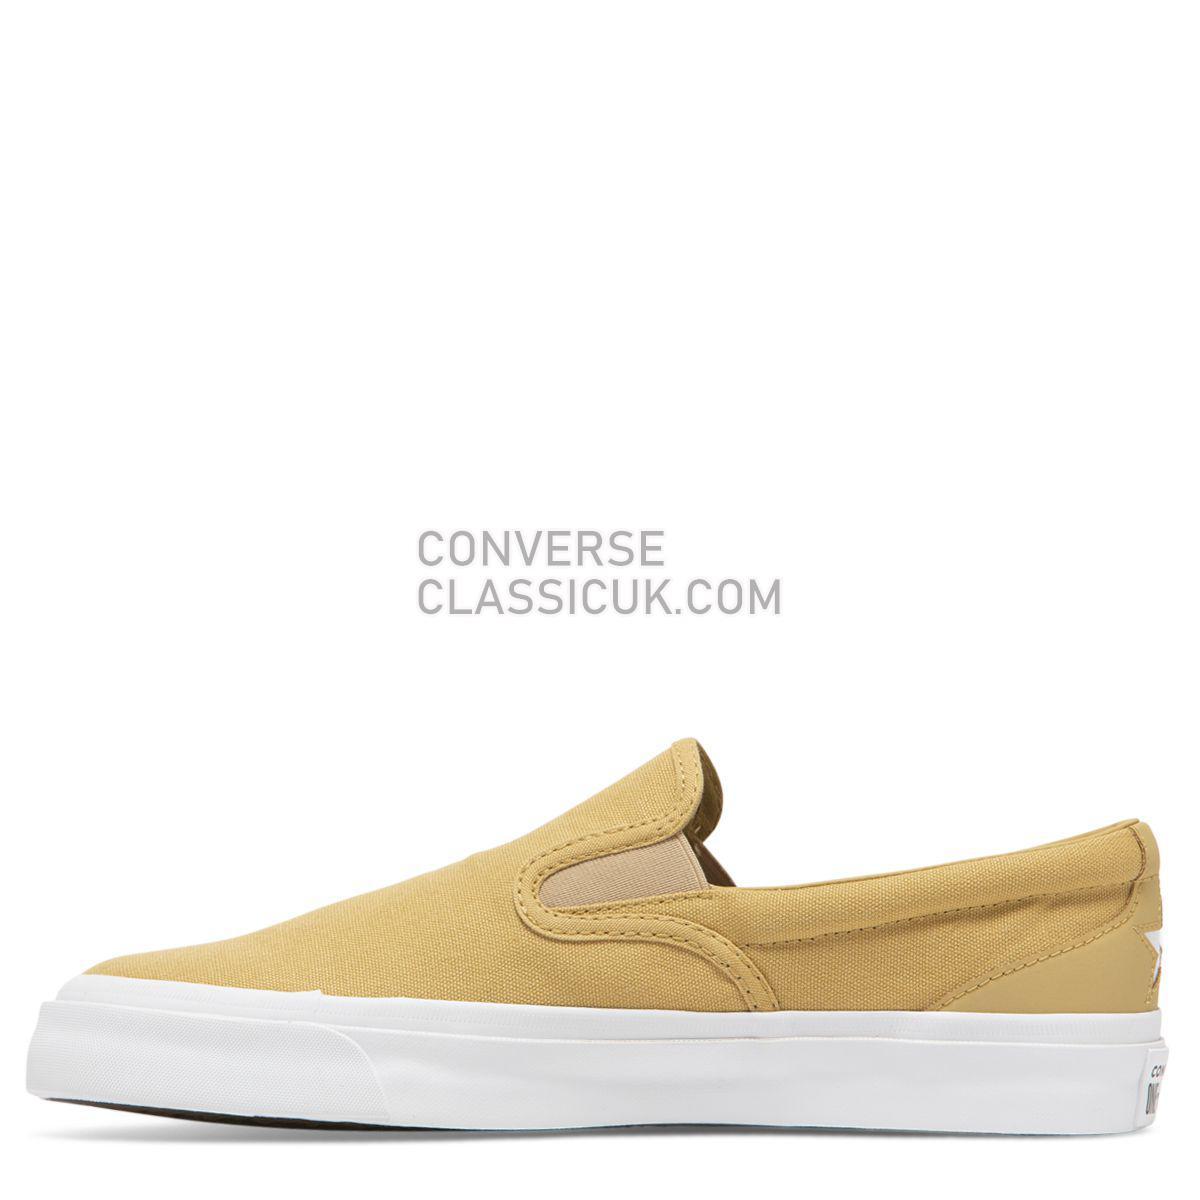 Converse CONS One Star CC Slip Club Gold Mens 163371 Club Gold/Club Gold/White Shoes